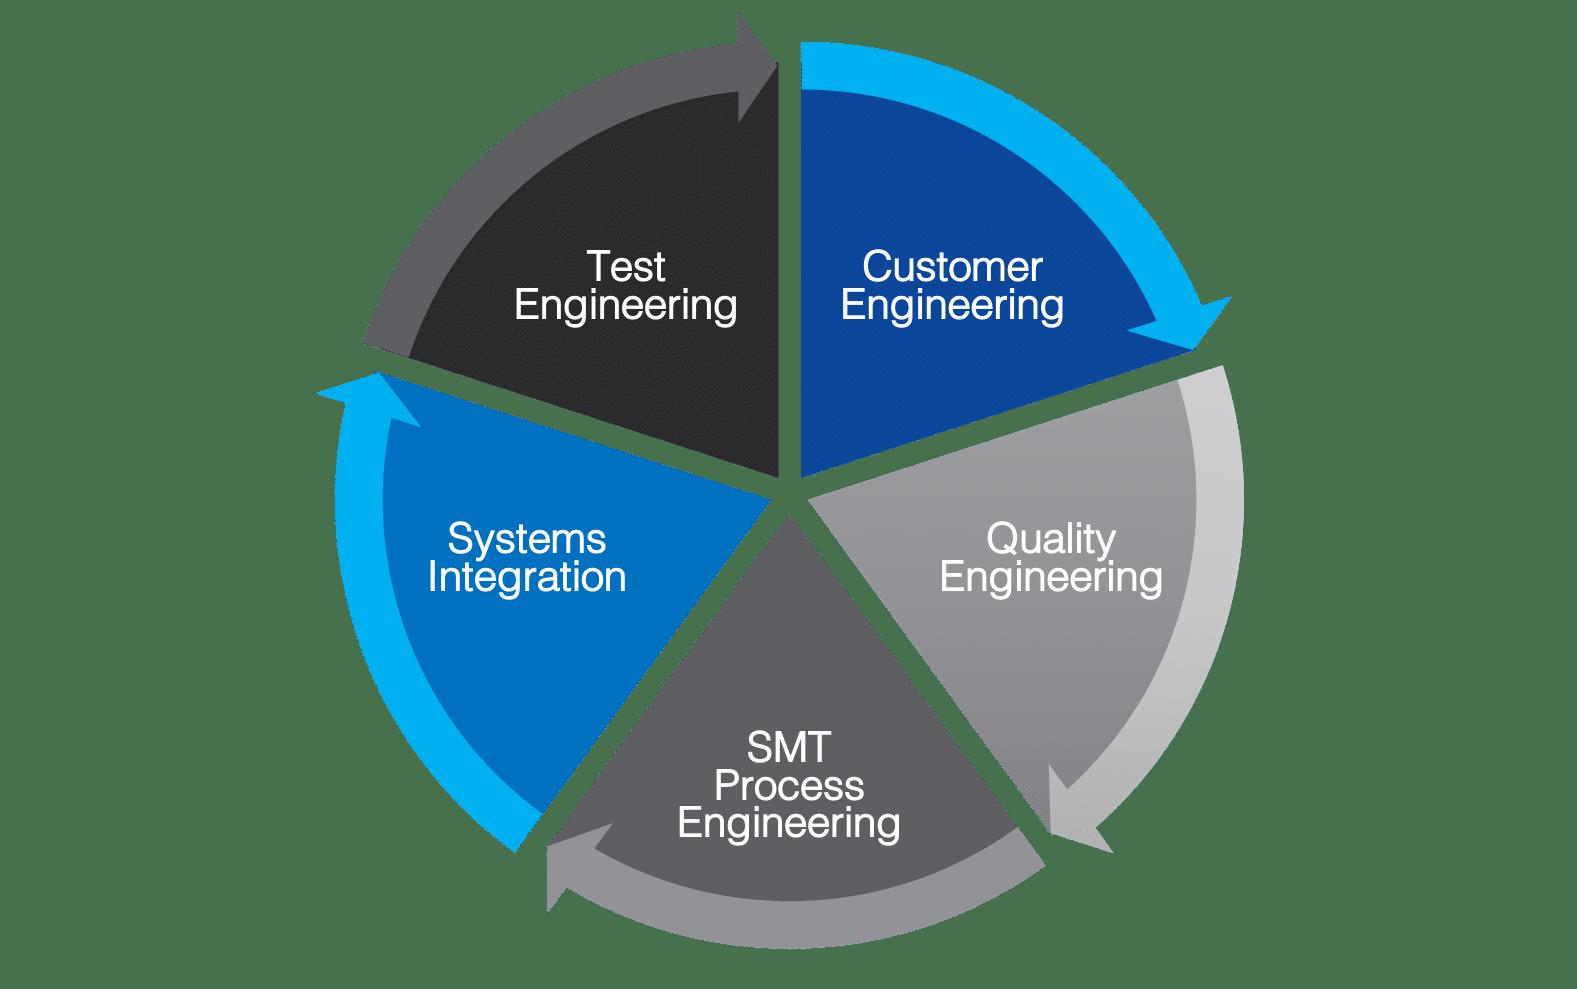 SMC - Focused Engineering Support